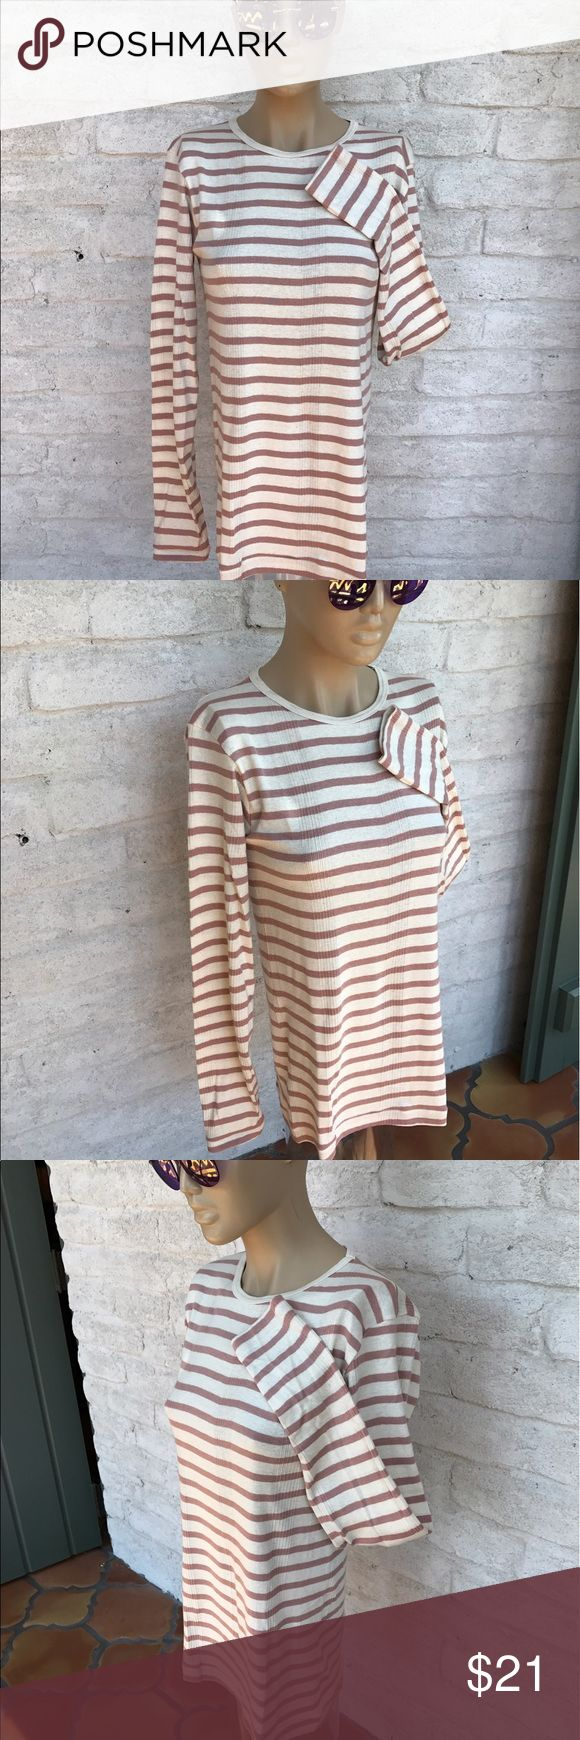 Edith A Miller Mauve & Cream Long Sleeve Top, NWOT Comfortable Edith A Miller 100% cotton long sleeved top. Size Large.  NWOT Edith A Miller Tops